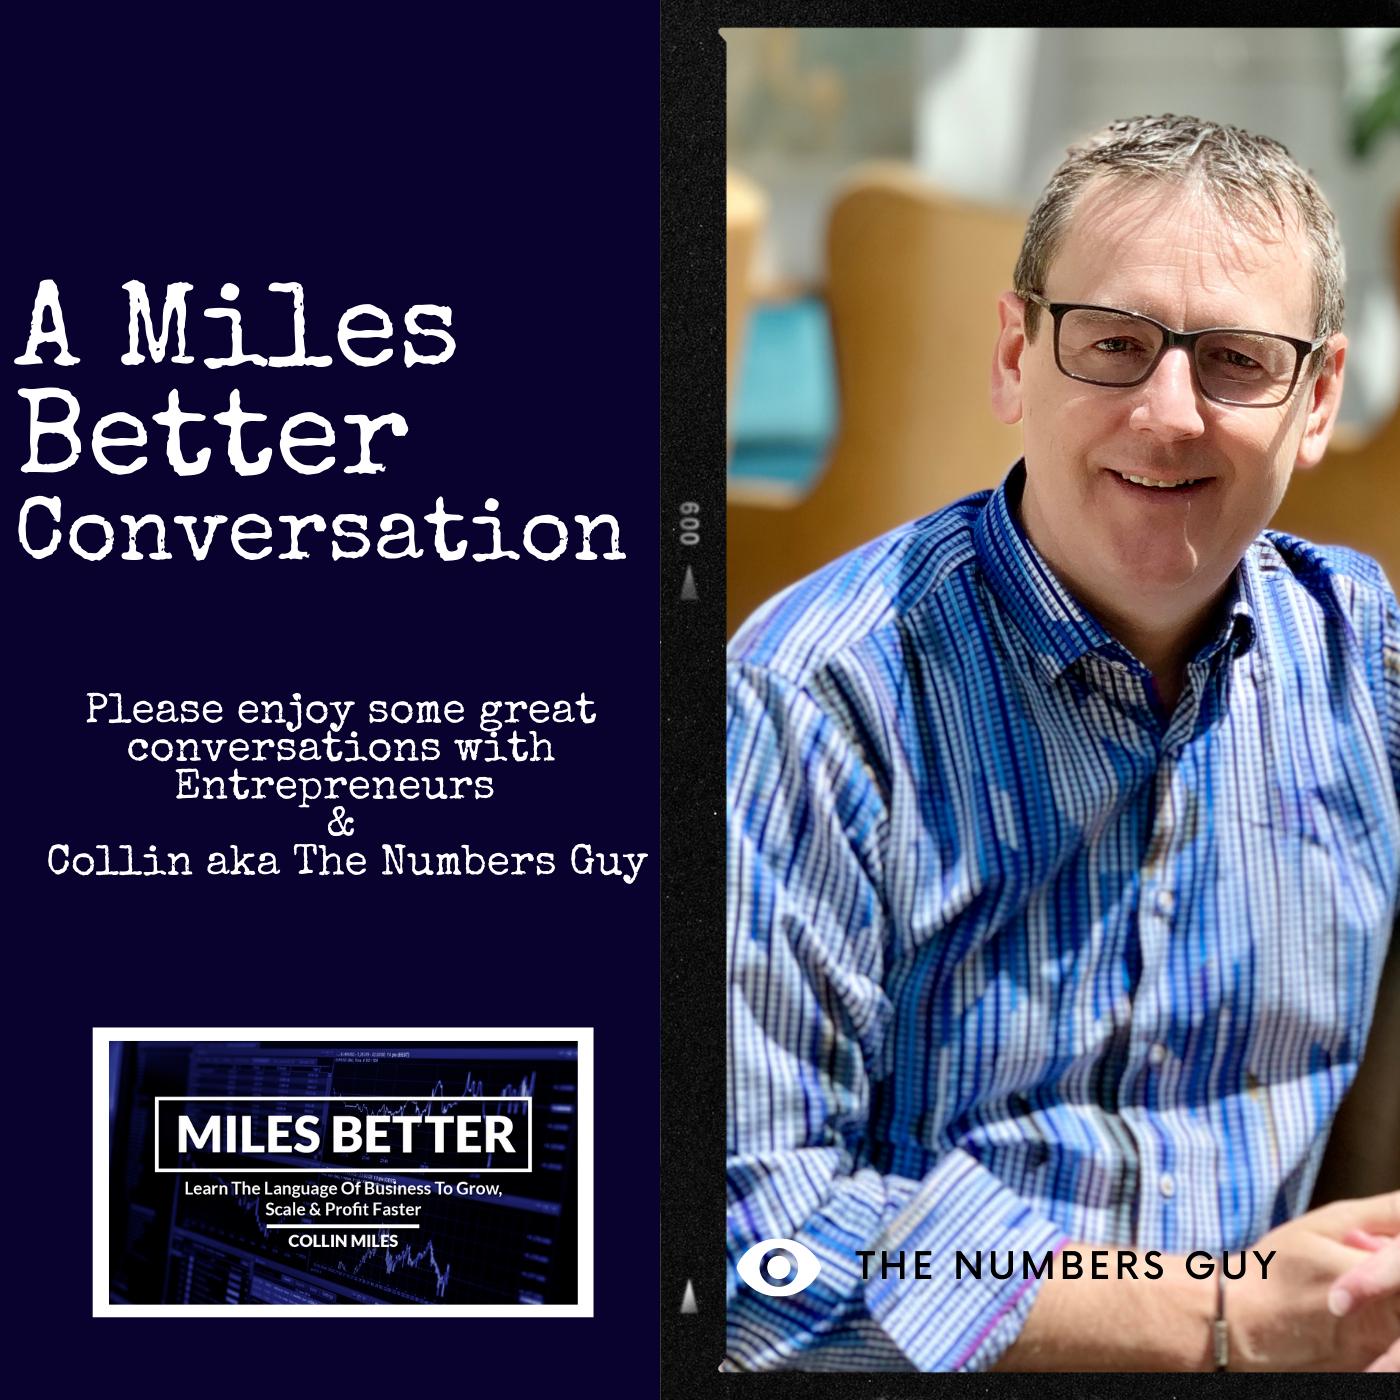 A Miles Better Conversation